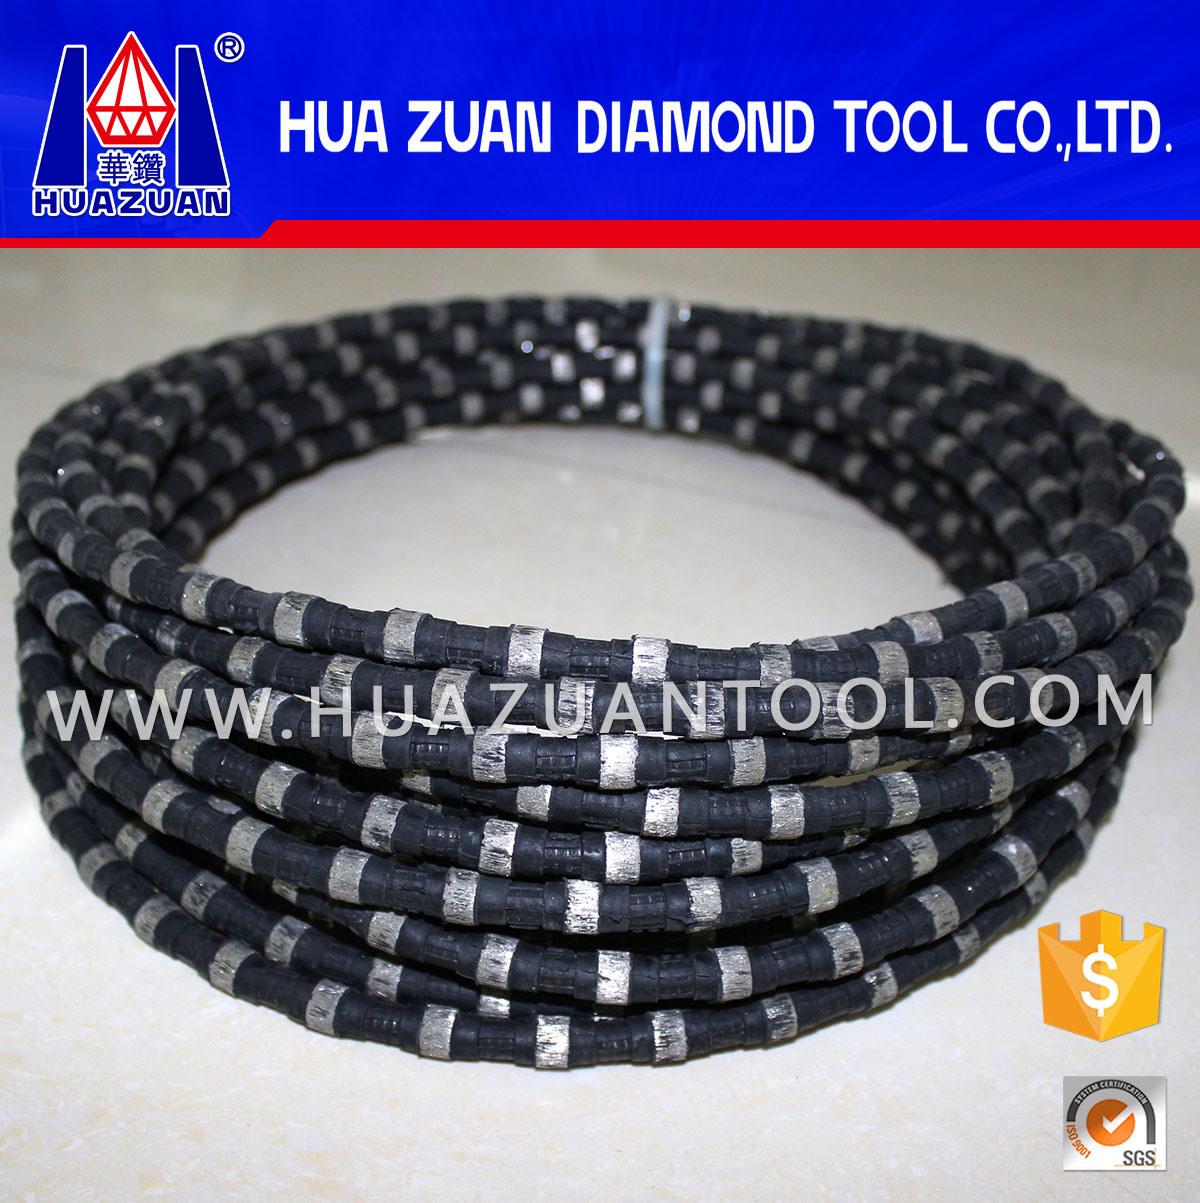 Attractive Wachs Diamond Wire Saw Composition - Wiring Standart ...